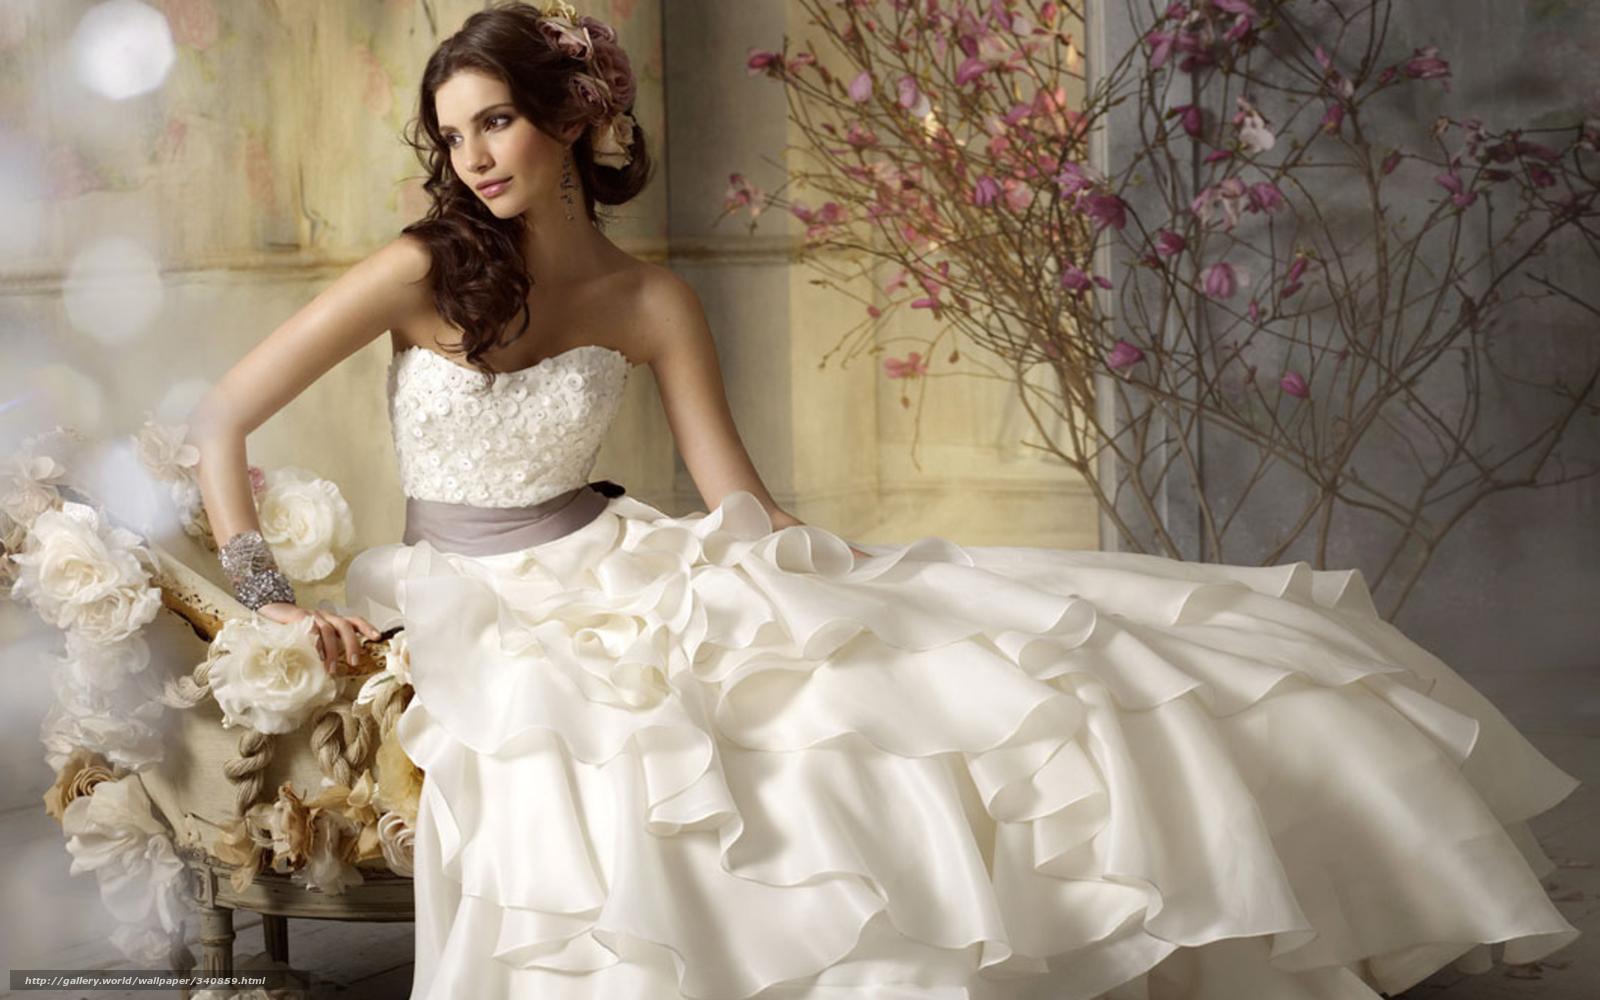 HD wallpaper Download wallpaper bride dress white Flowers free desktop wallpaper The Bride in White Dress Wallpaper wallpaper iphone  wallpaper 4k  iphone 5s wallpaper